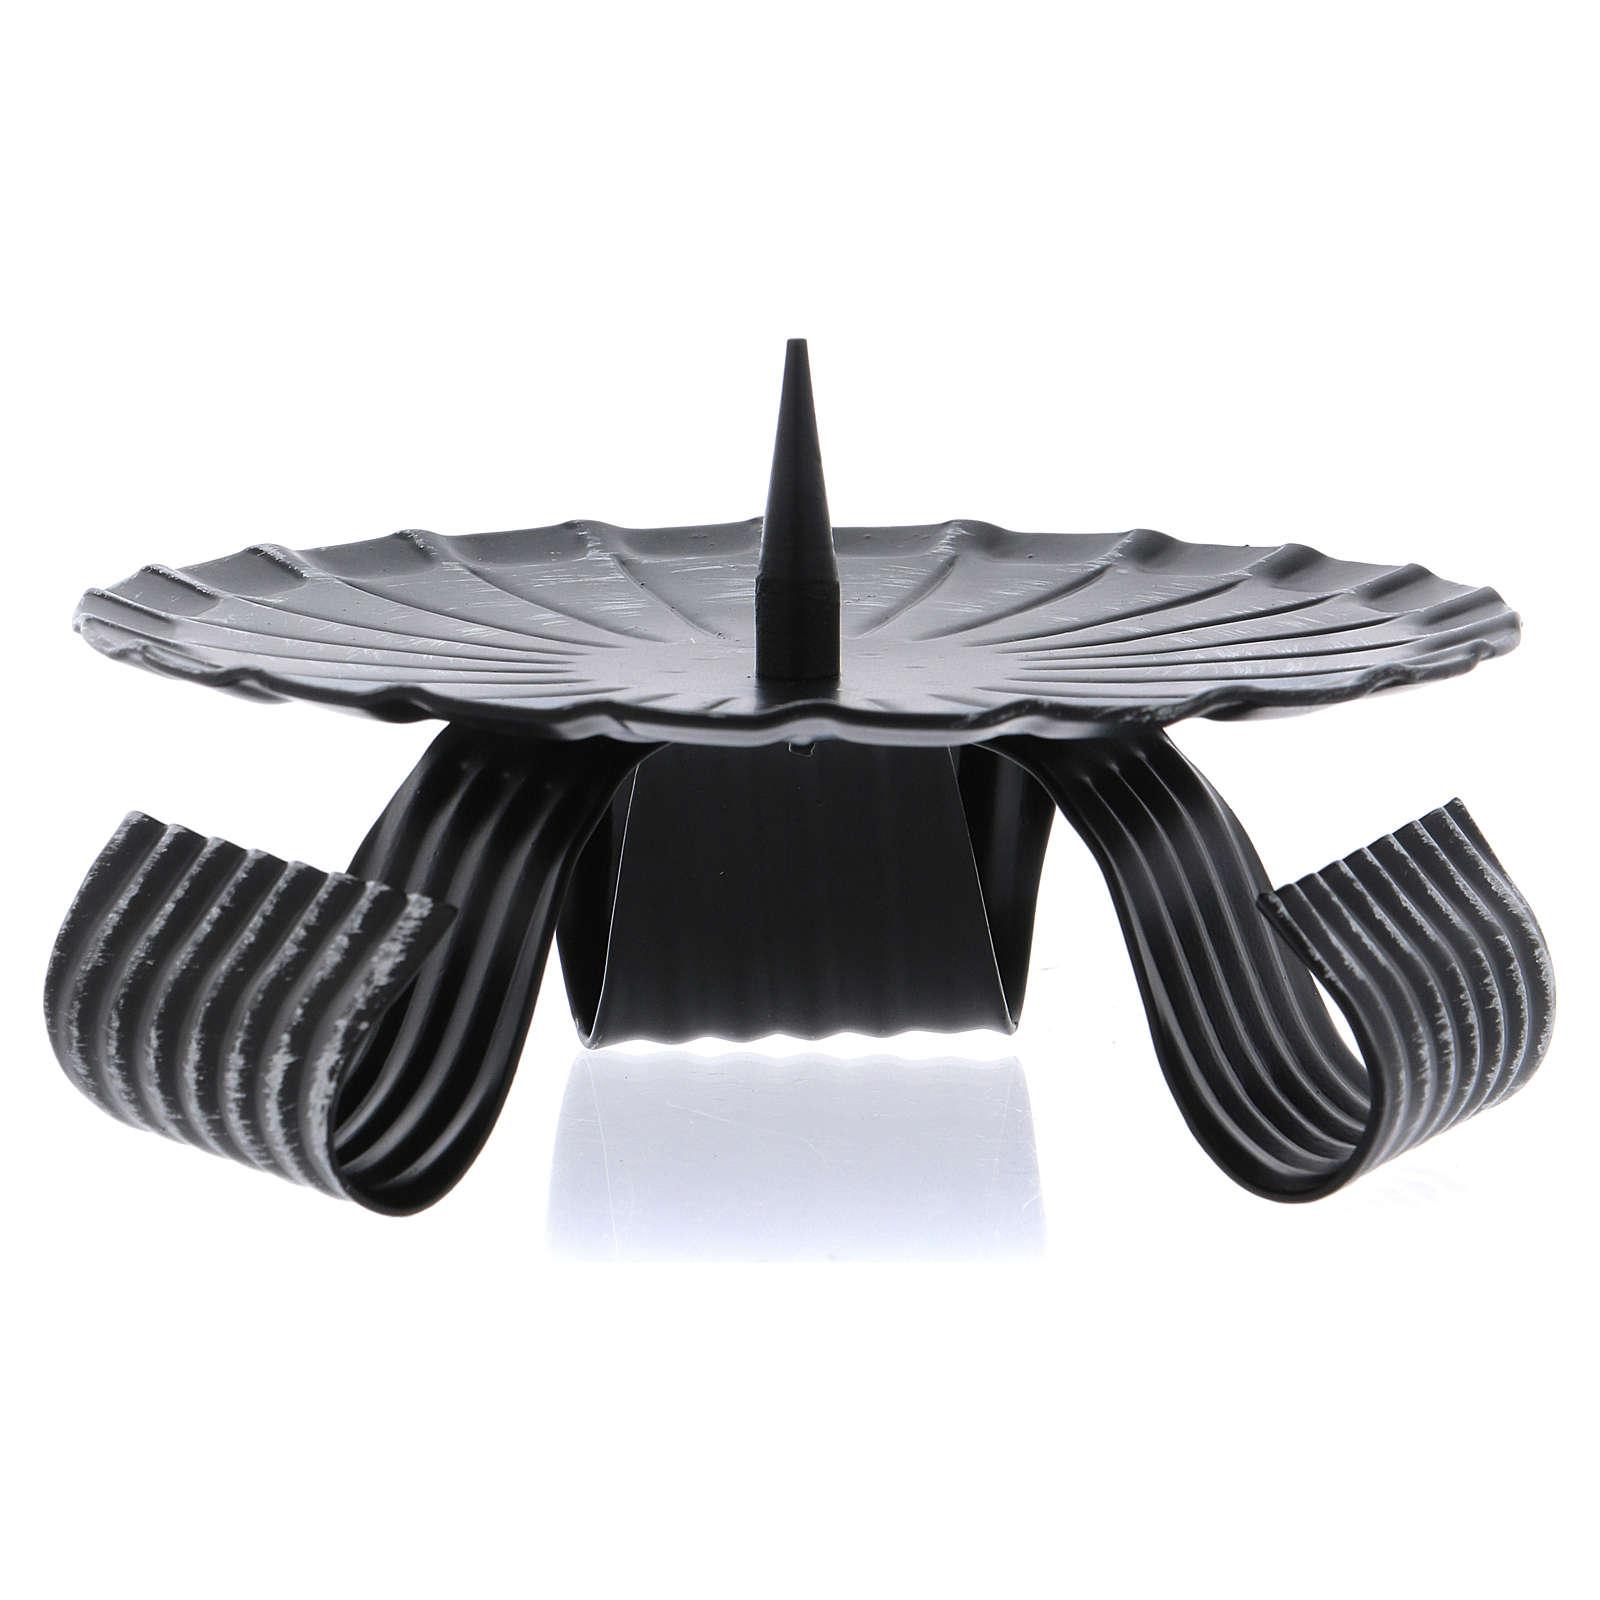 Portacandele treppiedi nero spuntone centrale ferro nero 12 cm 3